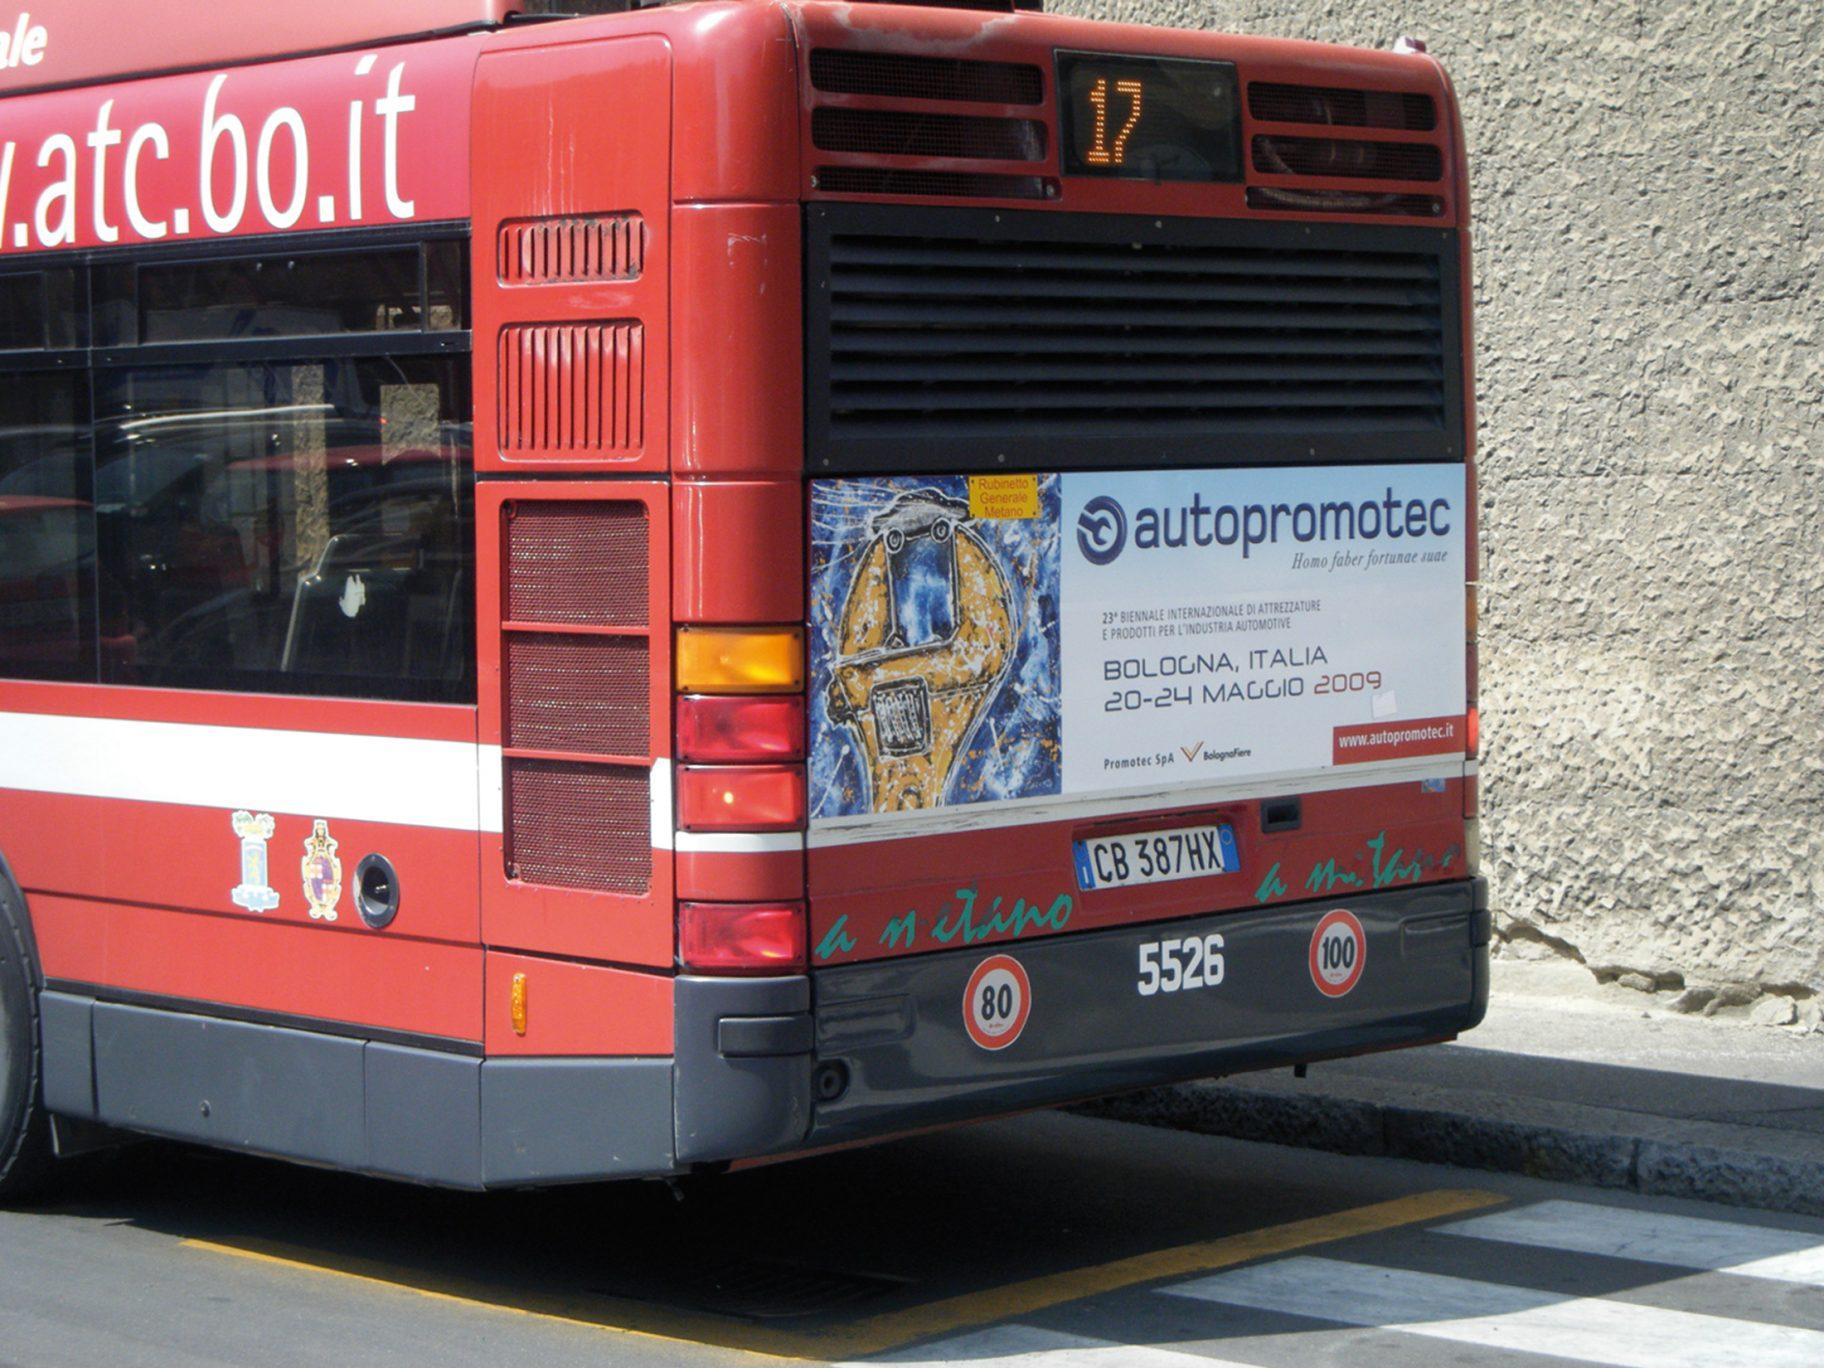 Autopromotec-fiera-2009-cartello 02